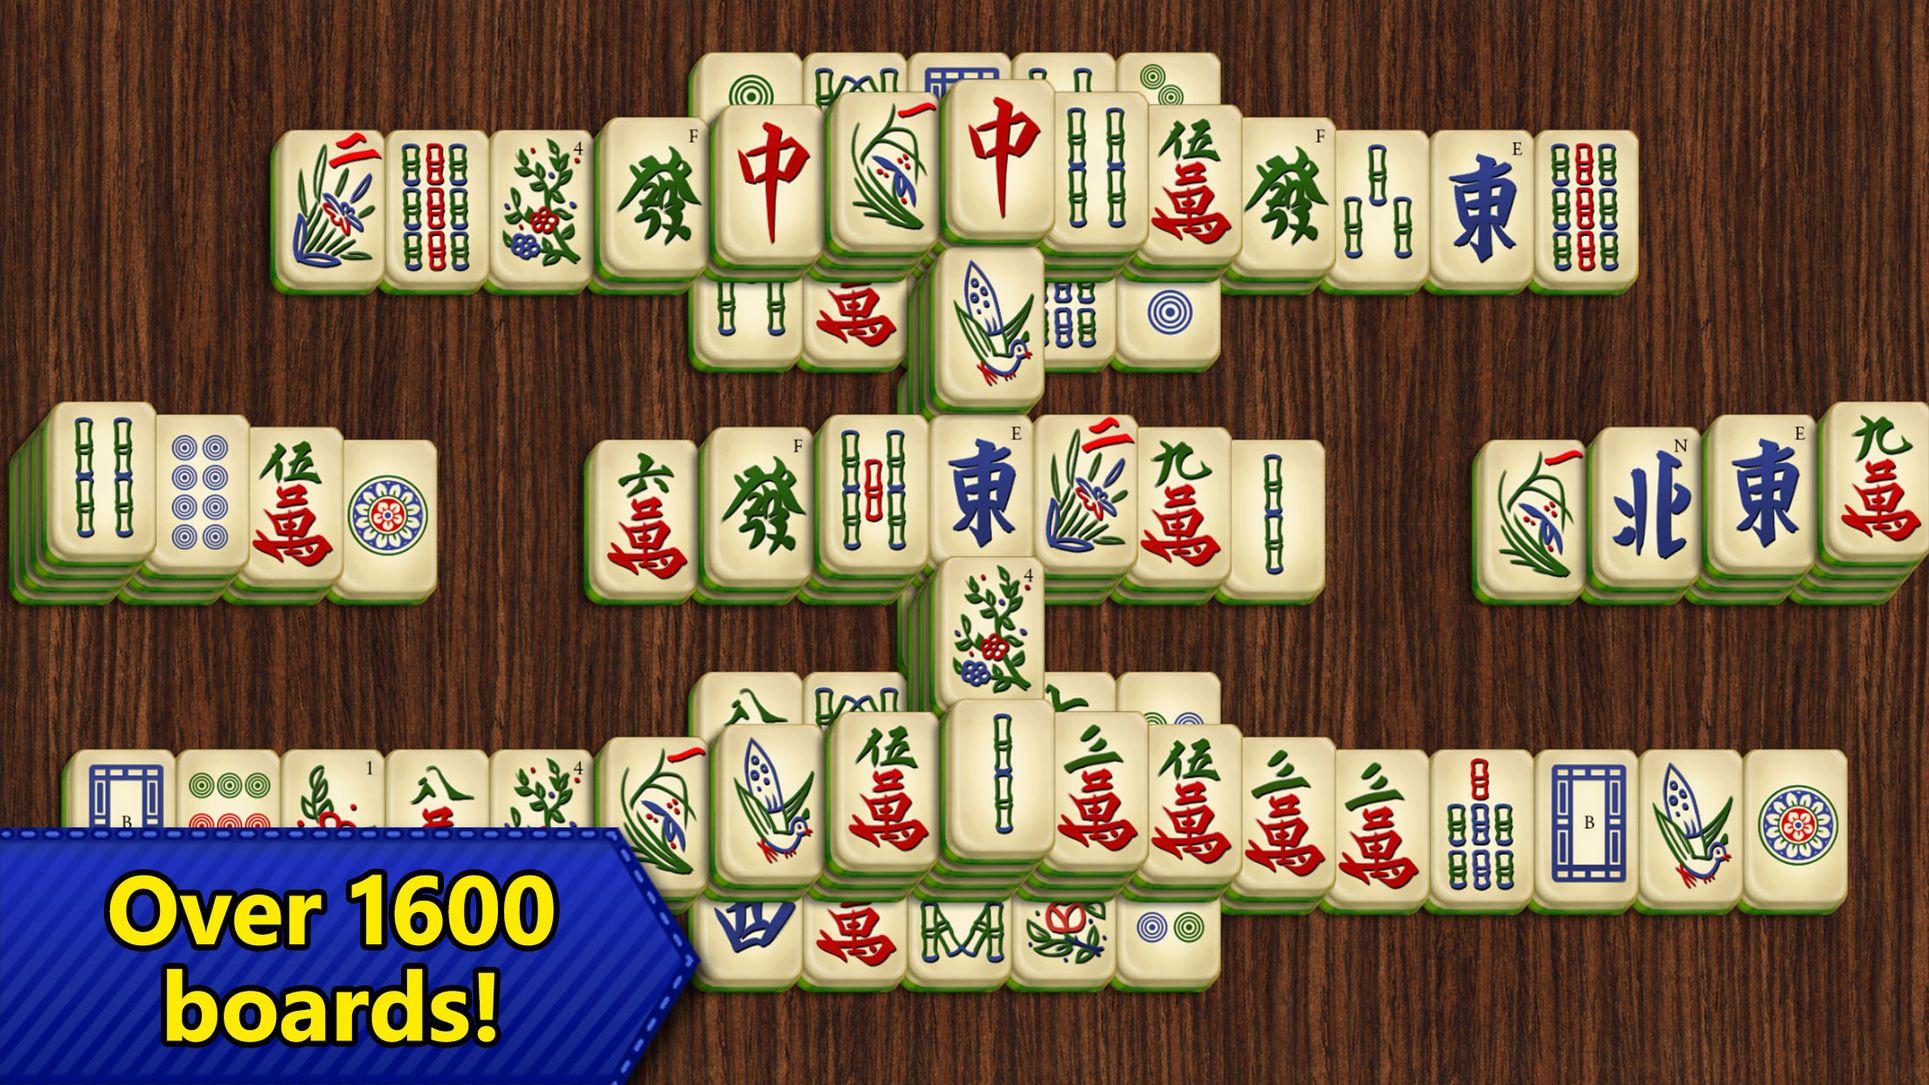 Mahjong Epic CardBoardappsios Mahjong, Relaxing game